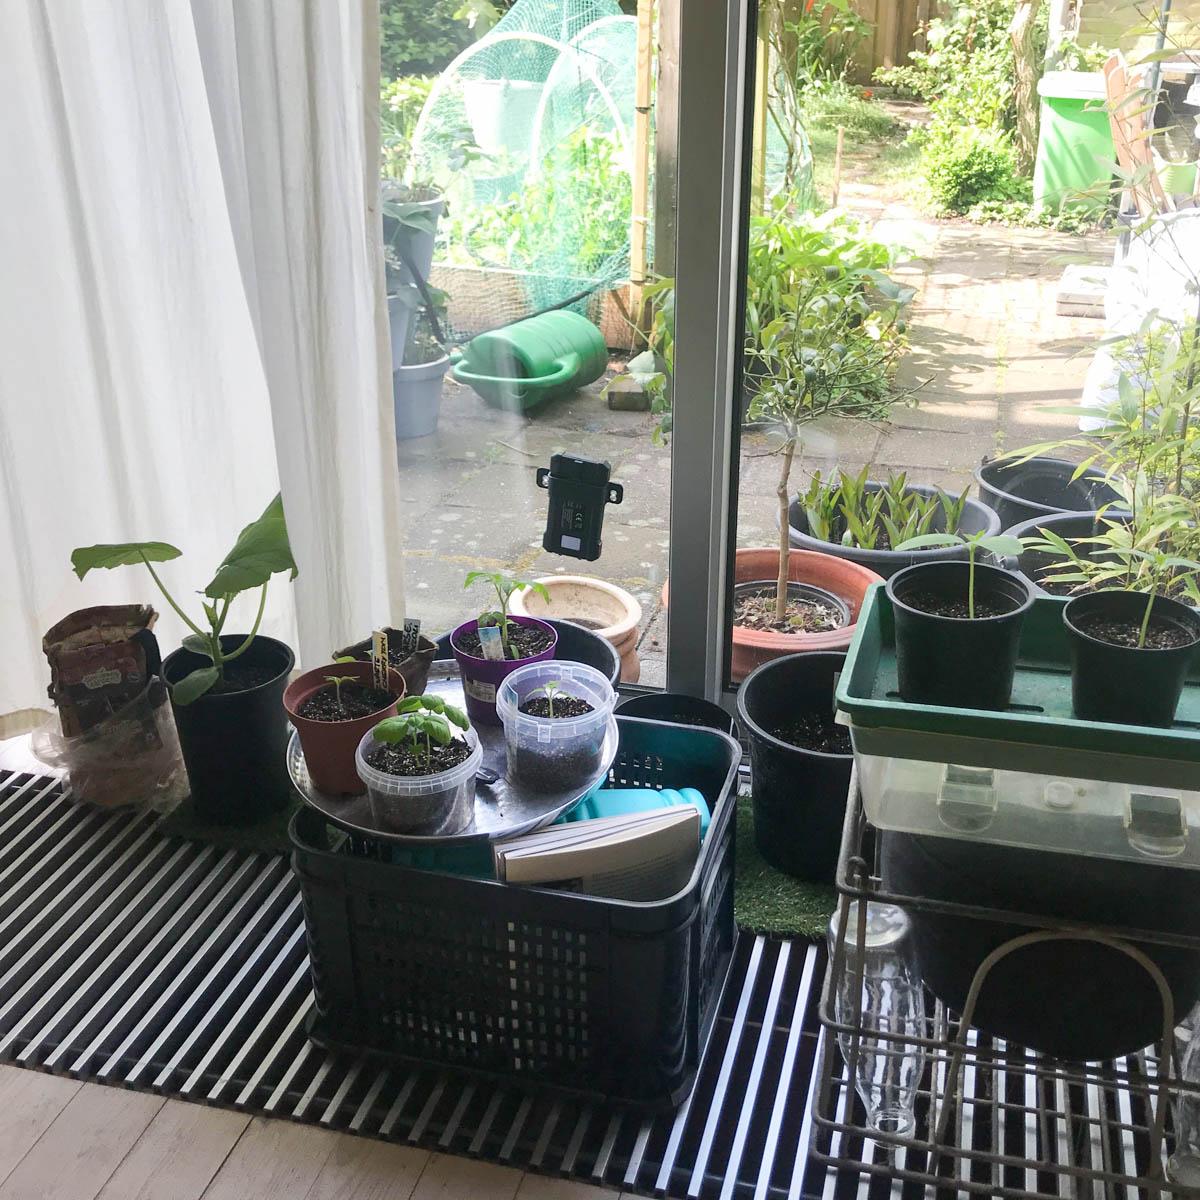 Vitrage beschermt courgette tegen te felle zon